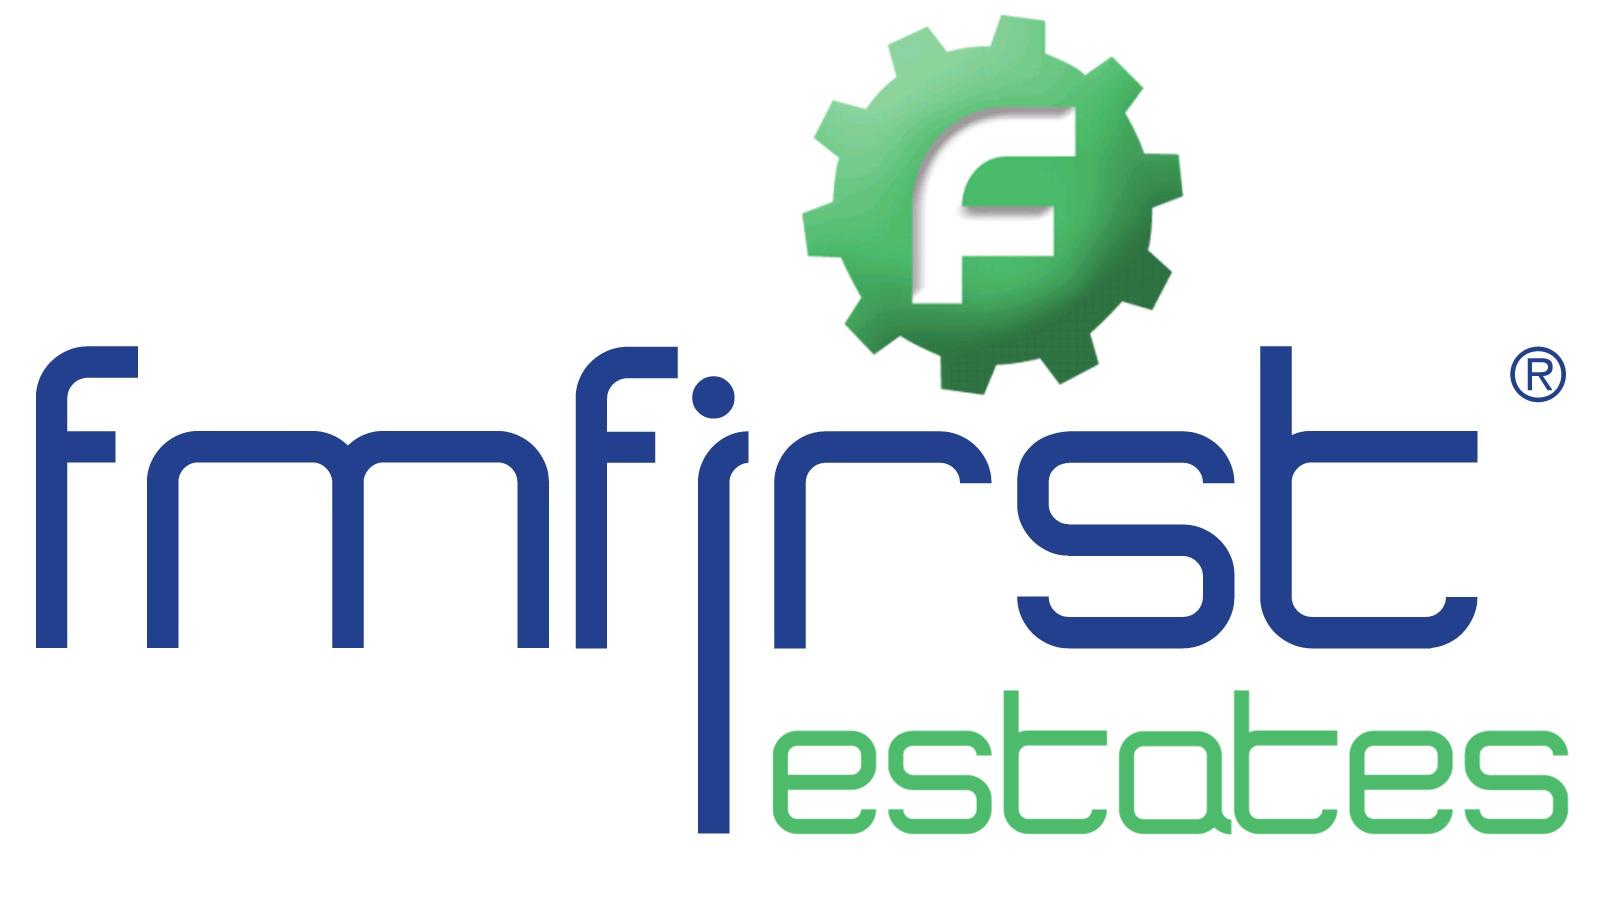 Facilities Management Software - fmfirst estates